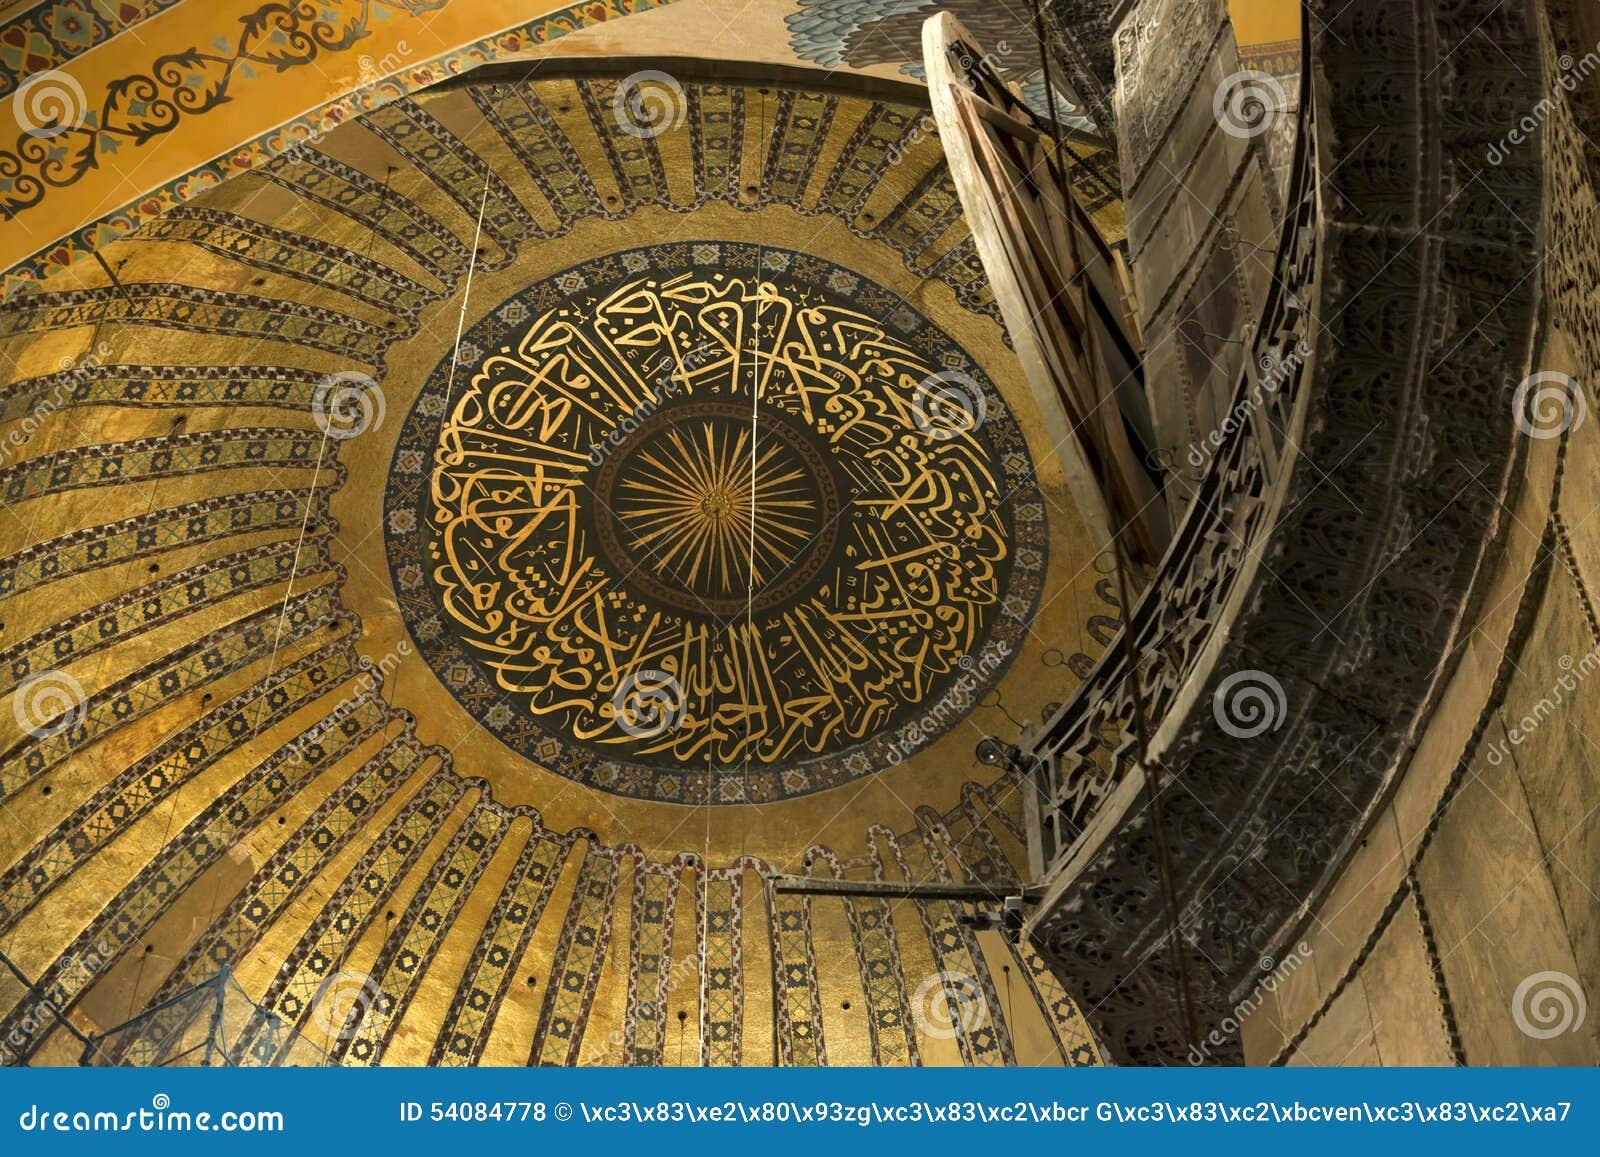 Hagia Sophia Ceiling Detail, Istanboel, Turkije